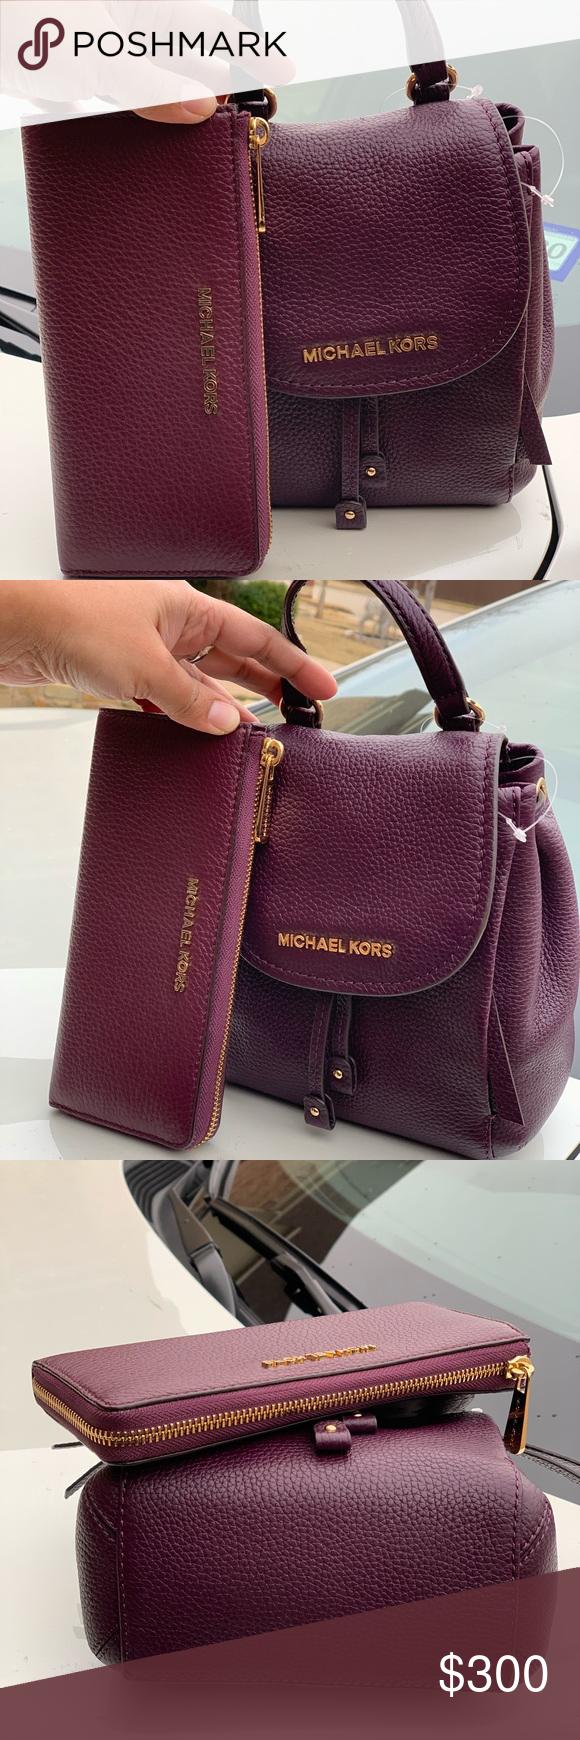 Michael Kors Riley backpack and wallet NWT Michael Kors